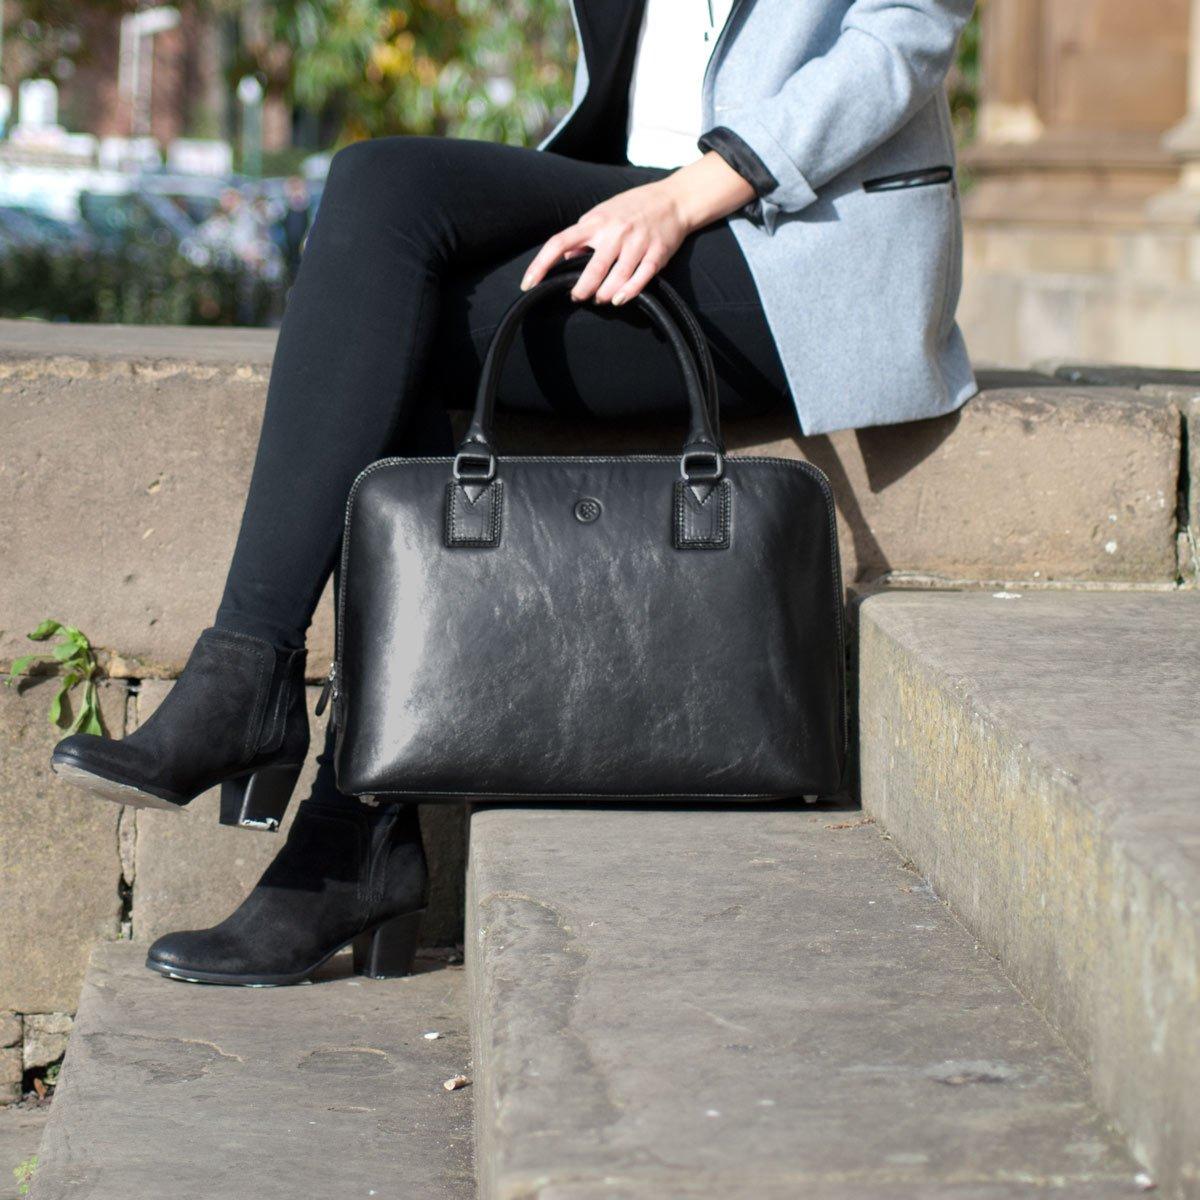 Maxwell Scott Luxury Ladies Black Leather Work Bag Purse for Macbook (Fiorella) by Maxwell Scott Bags (Image #8)